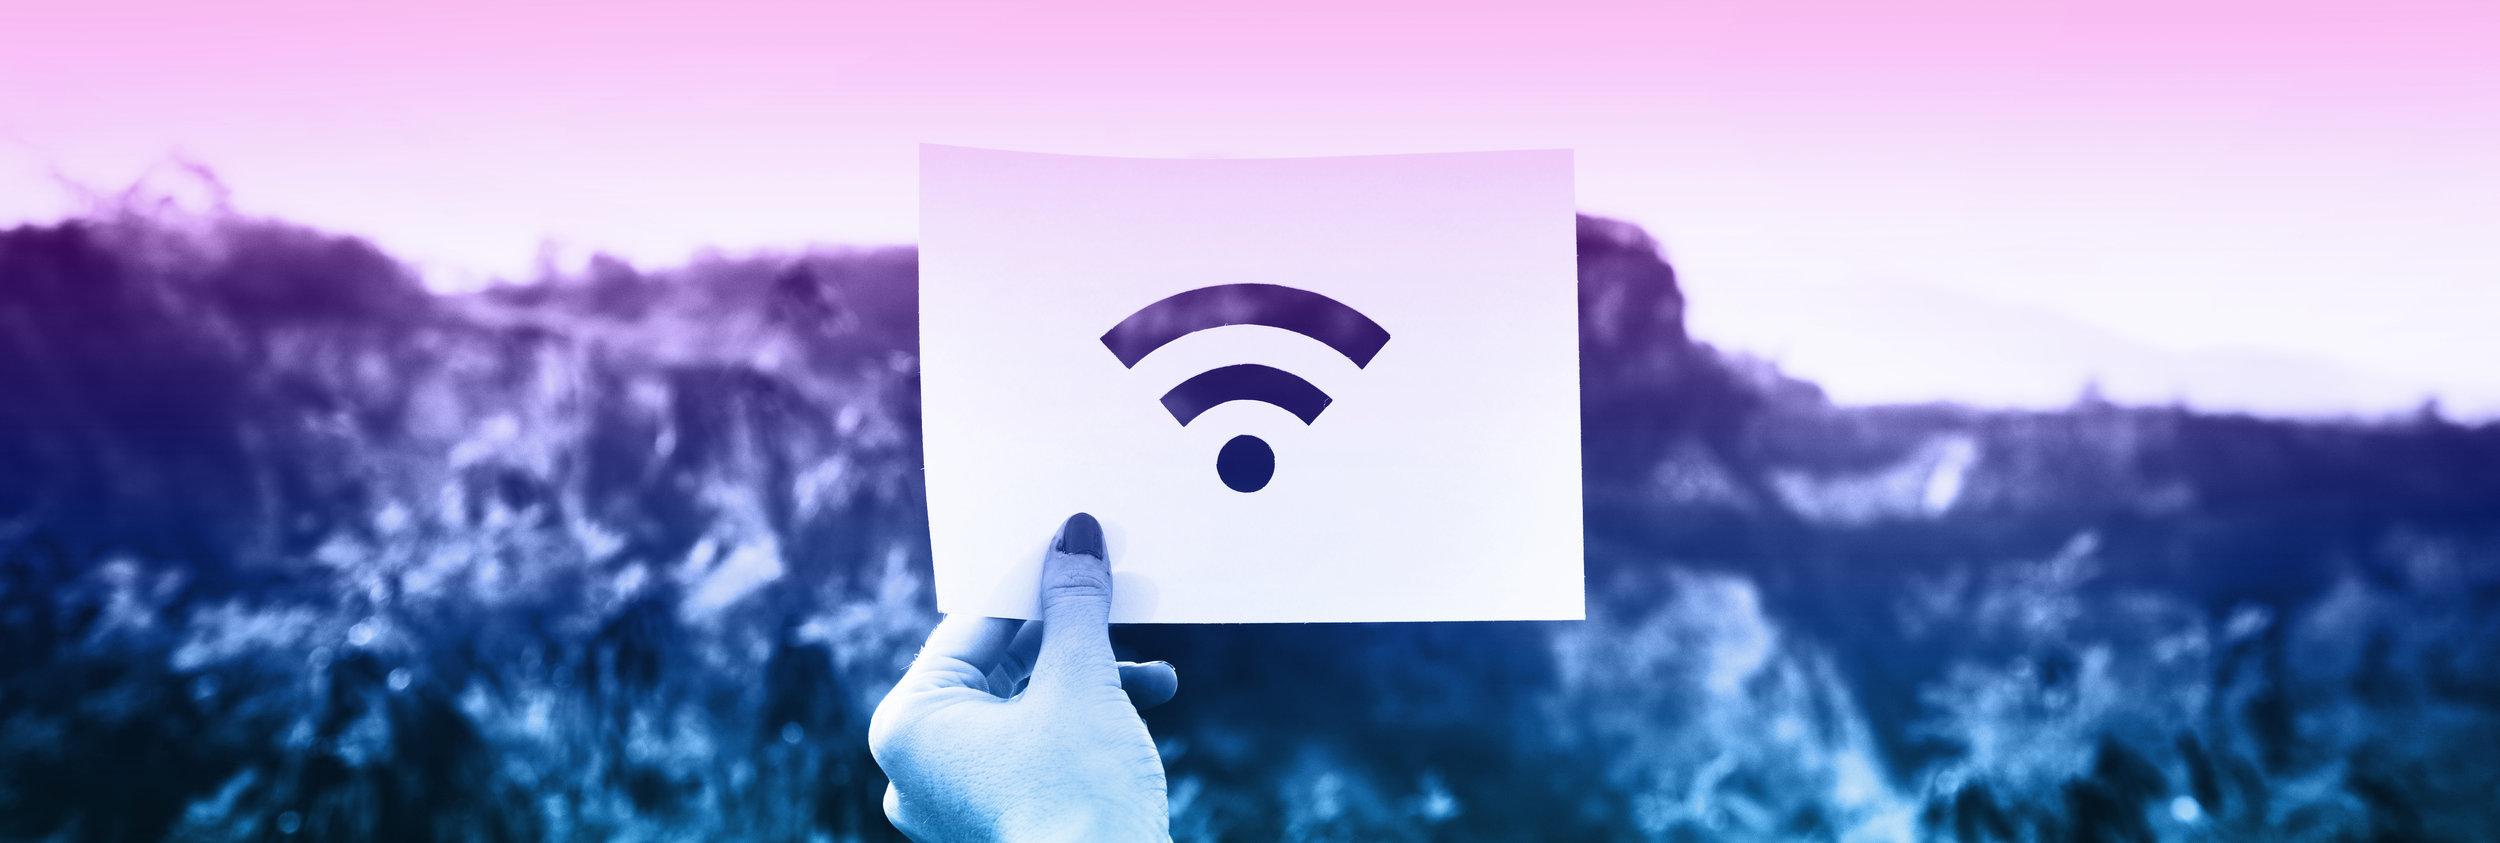 Telecoms & Wi-Fi rise group me.jpg